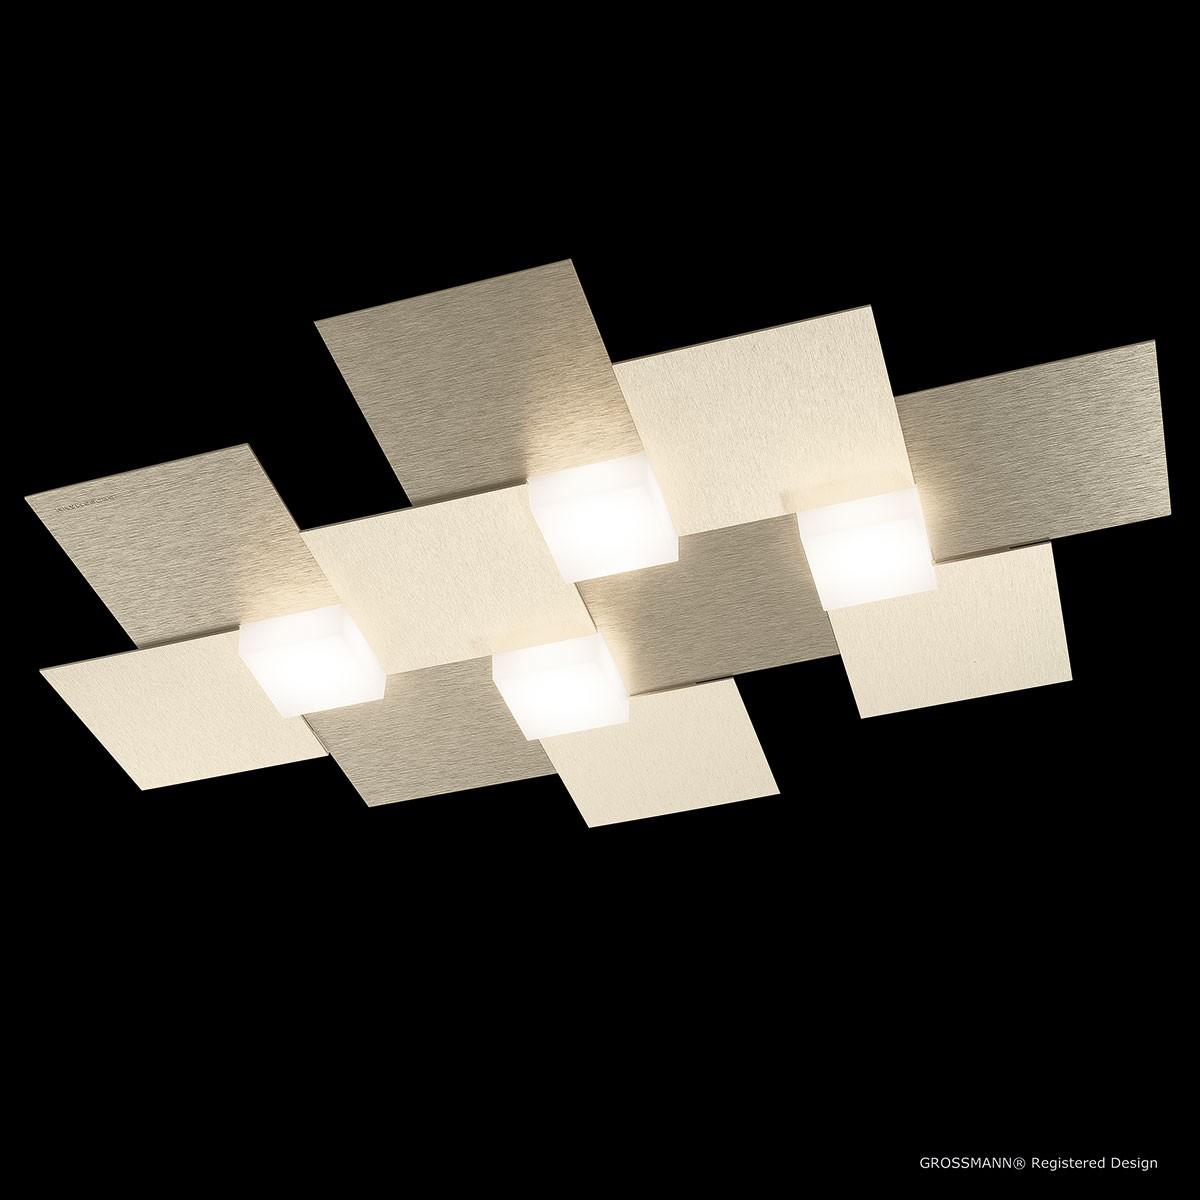 Grossmann Creo LED Deckenleuchte, champagner, 38,5 x 55 cm